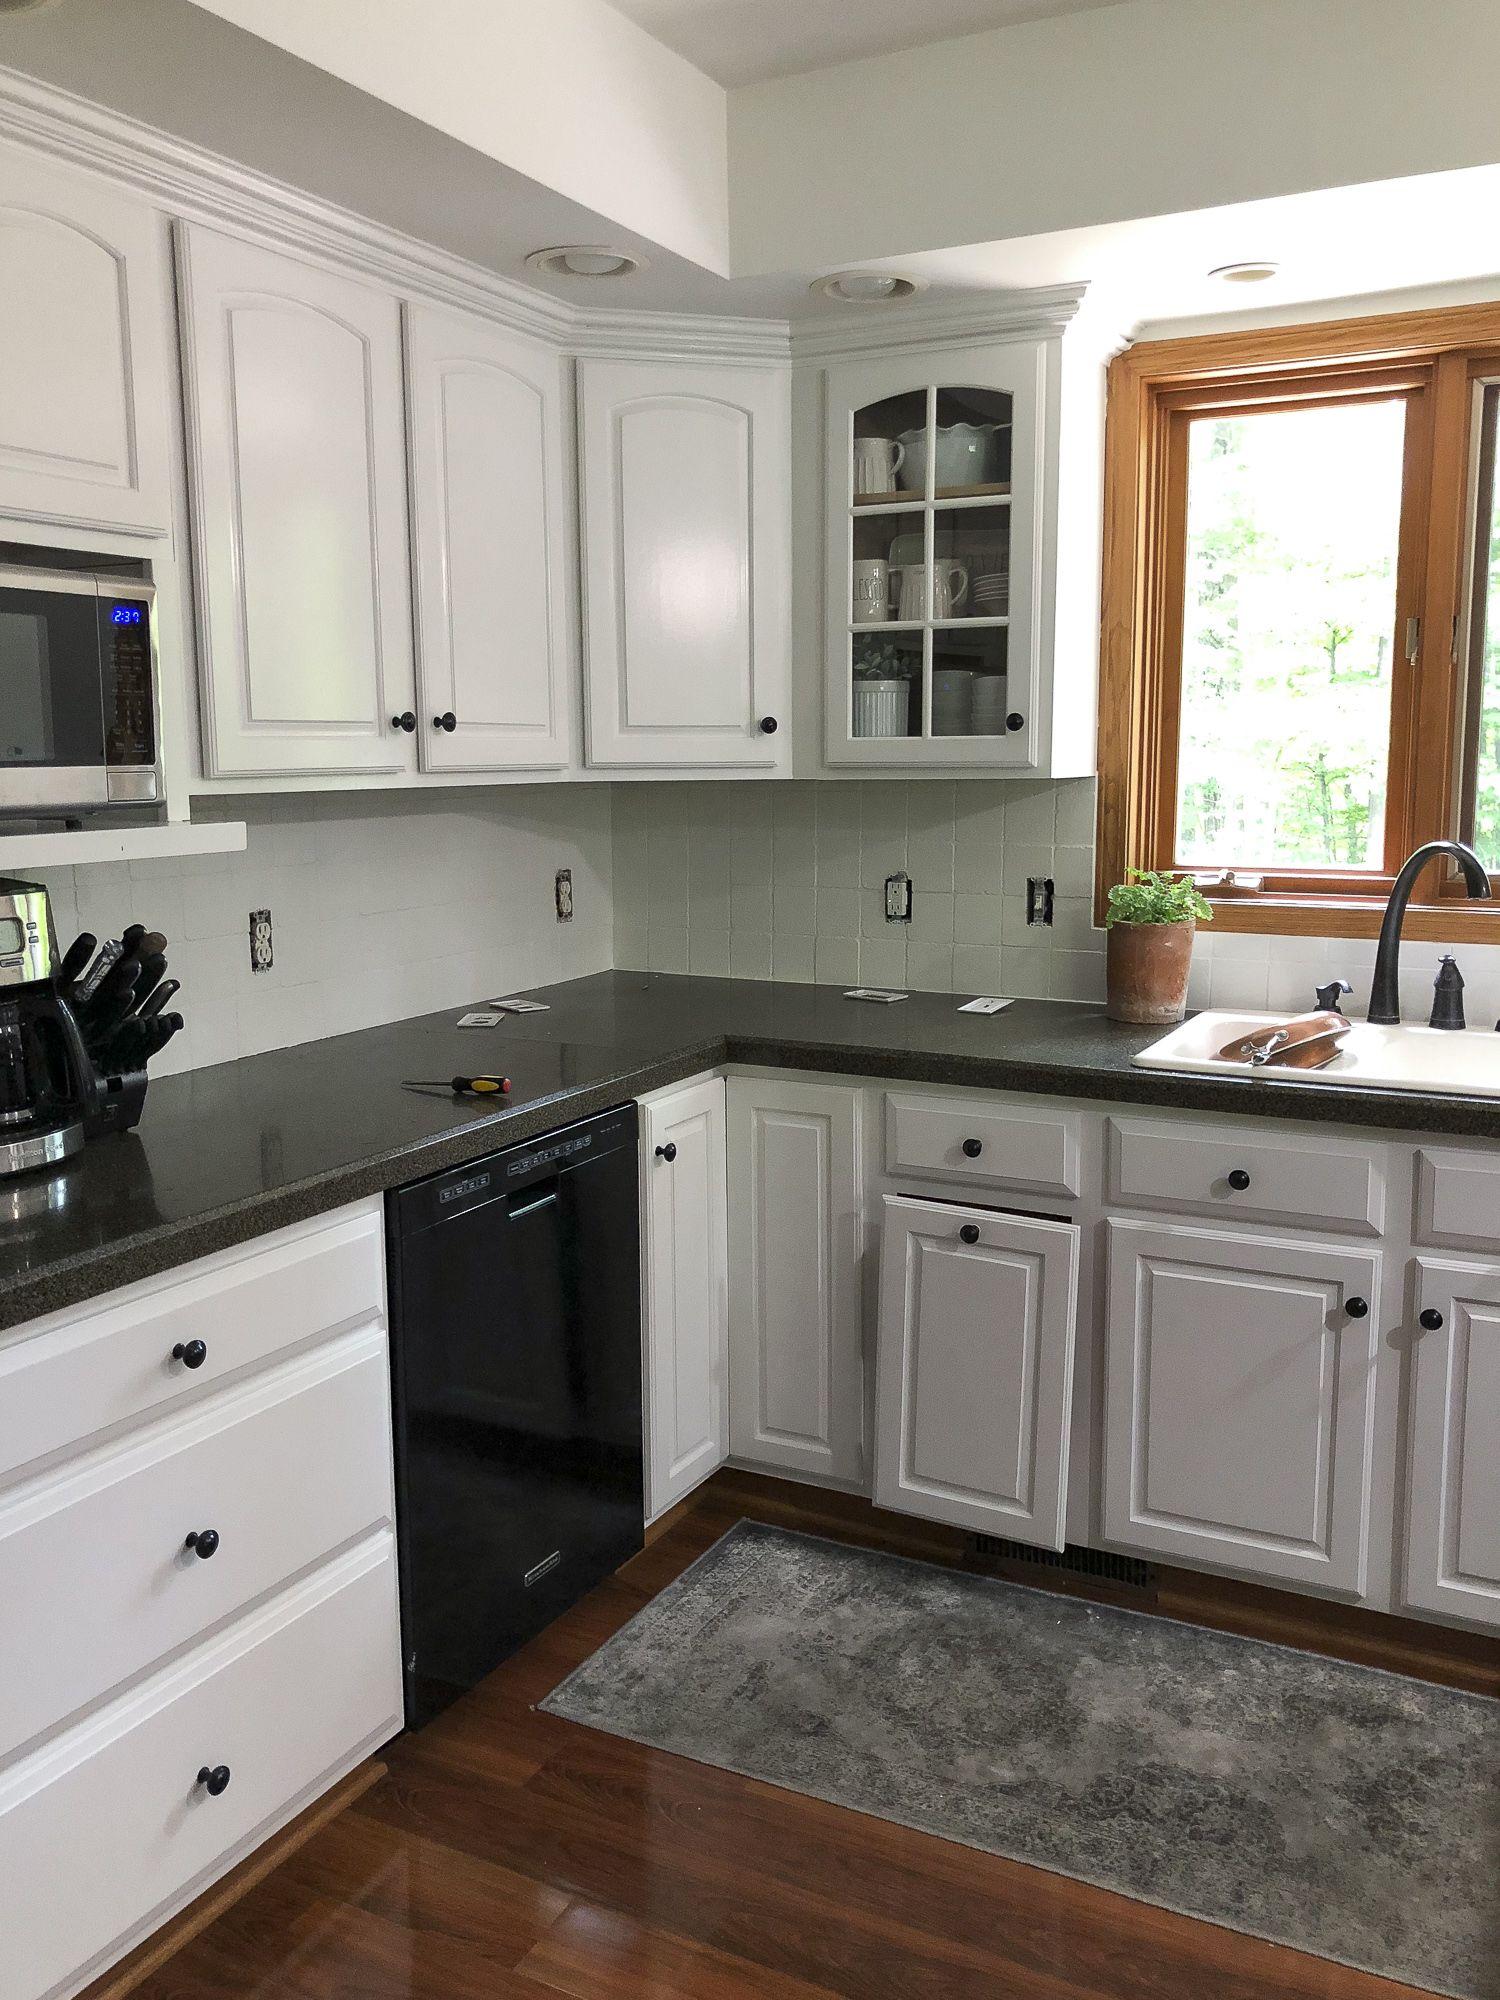 How To Paint A Tile Backsplash Kitchen Renovation Kitchen